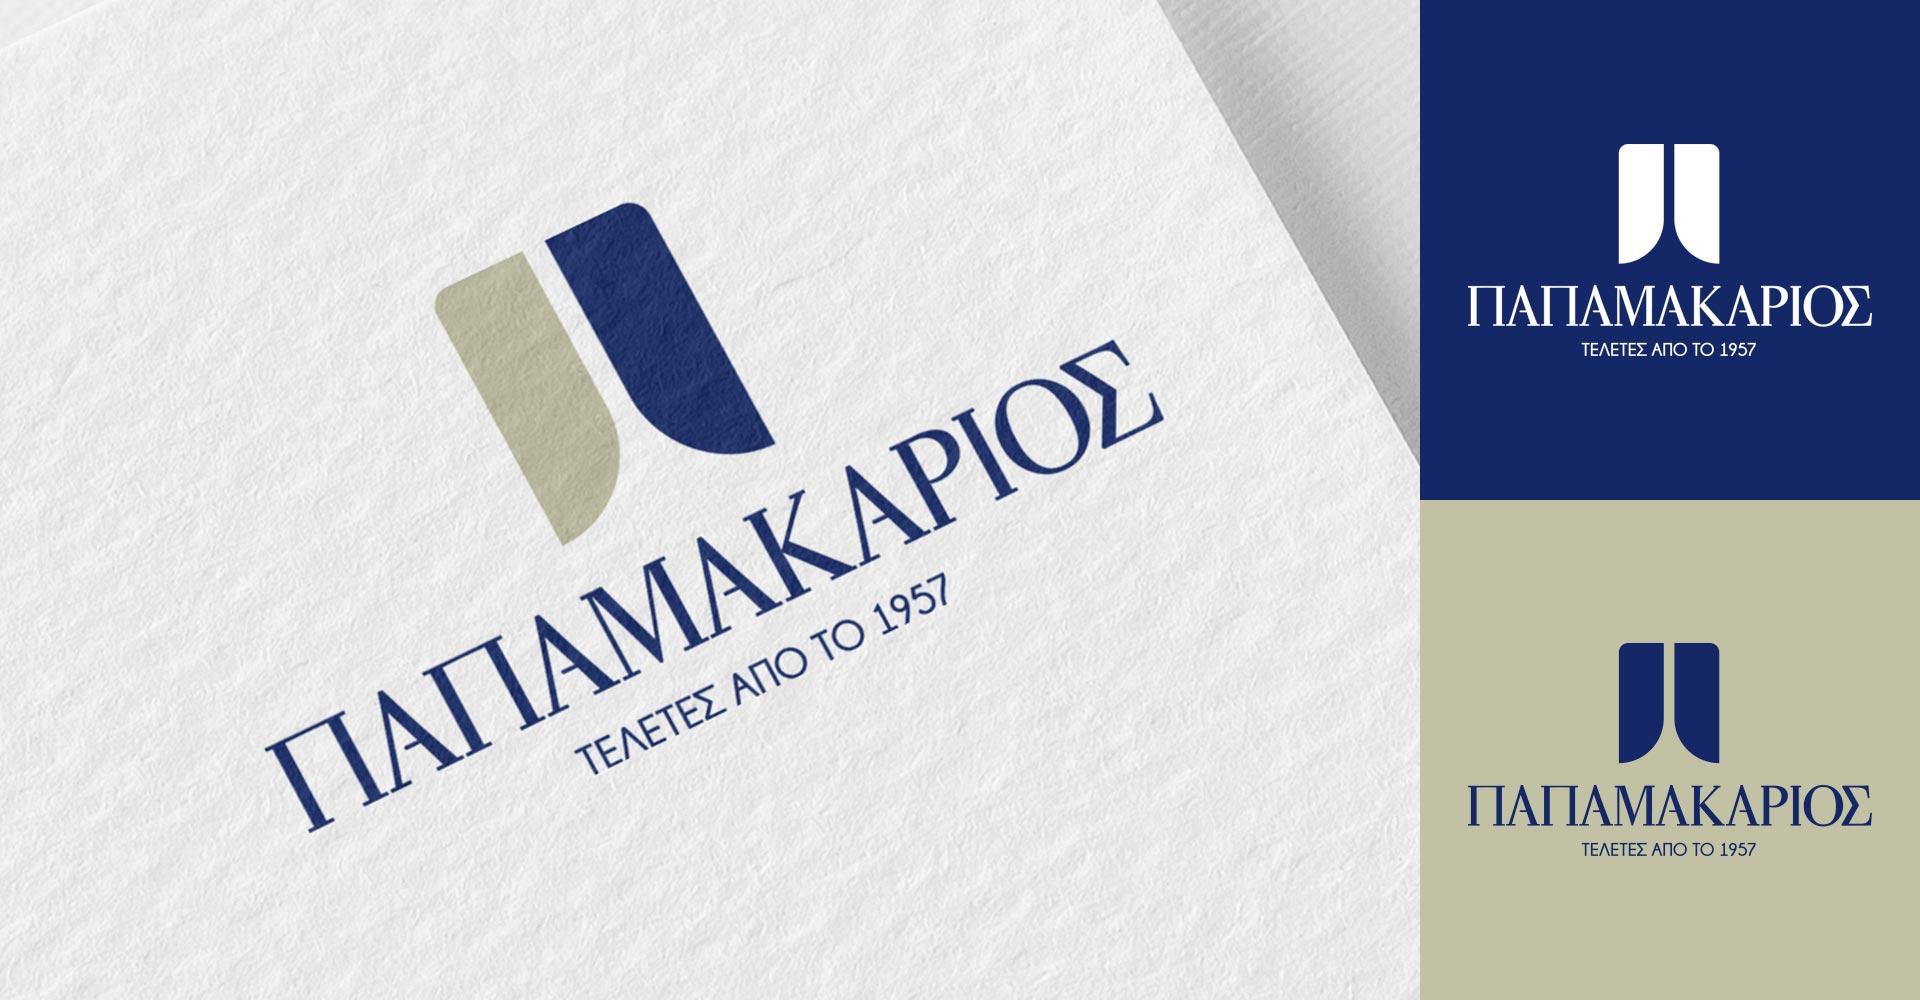 papamak-01